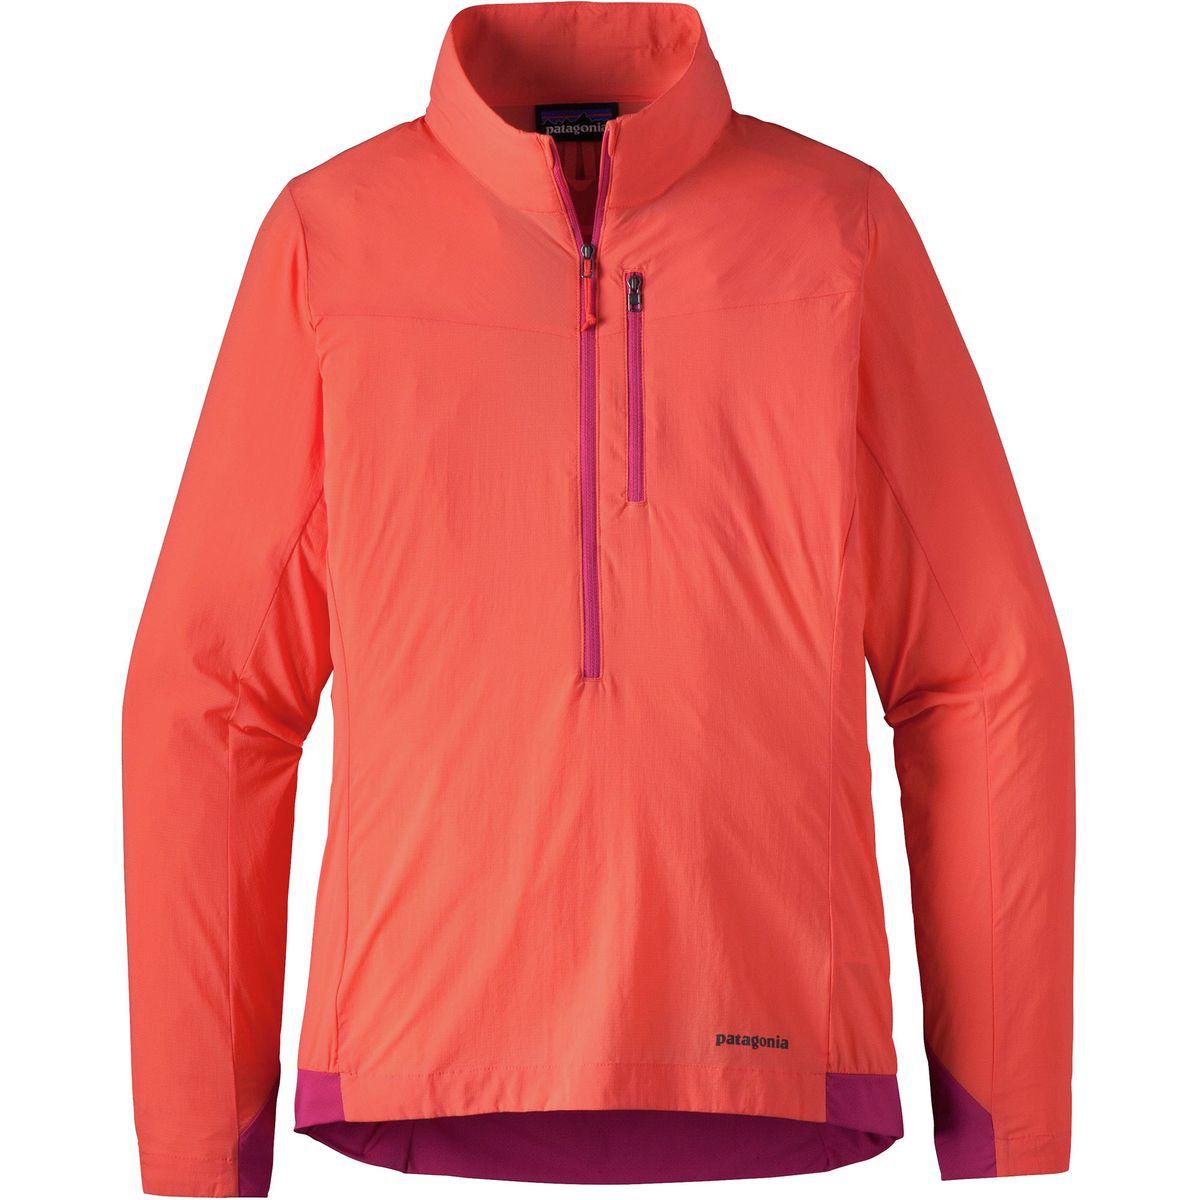 Patagonia Airshed Pullover Jacket - Women